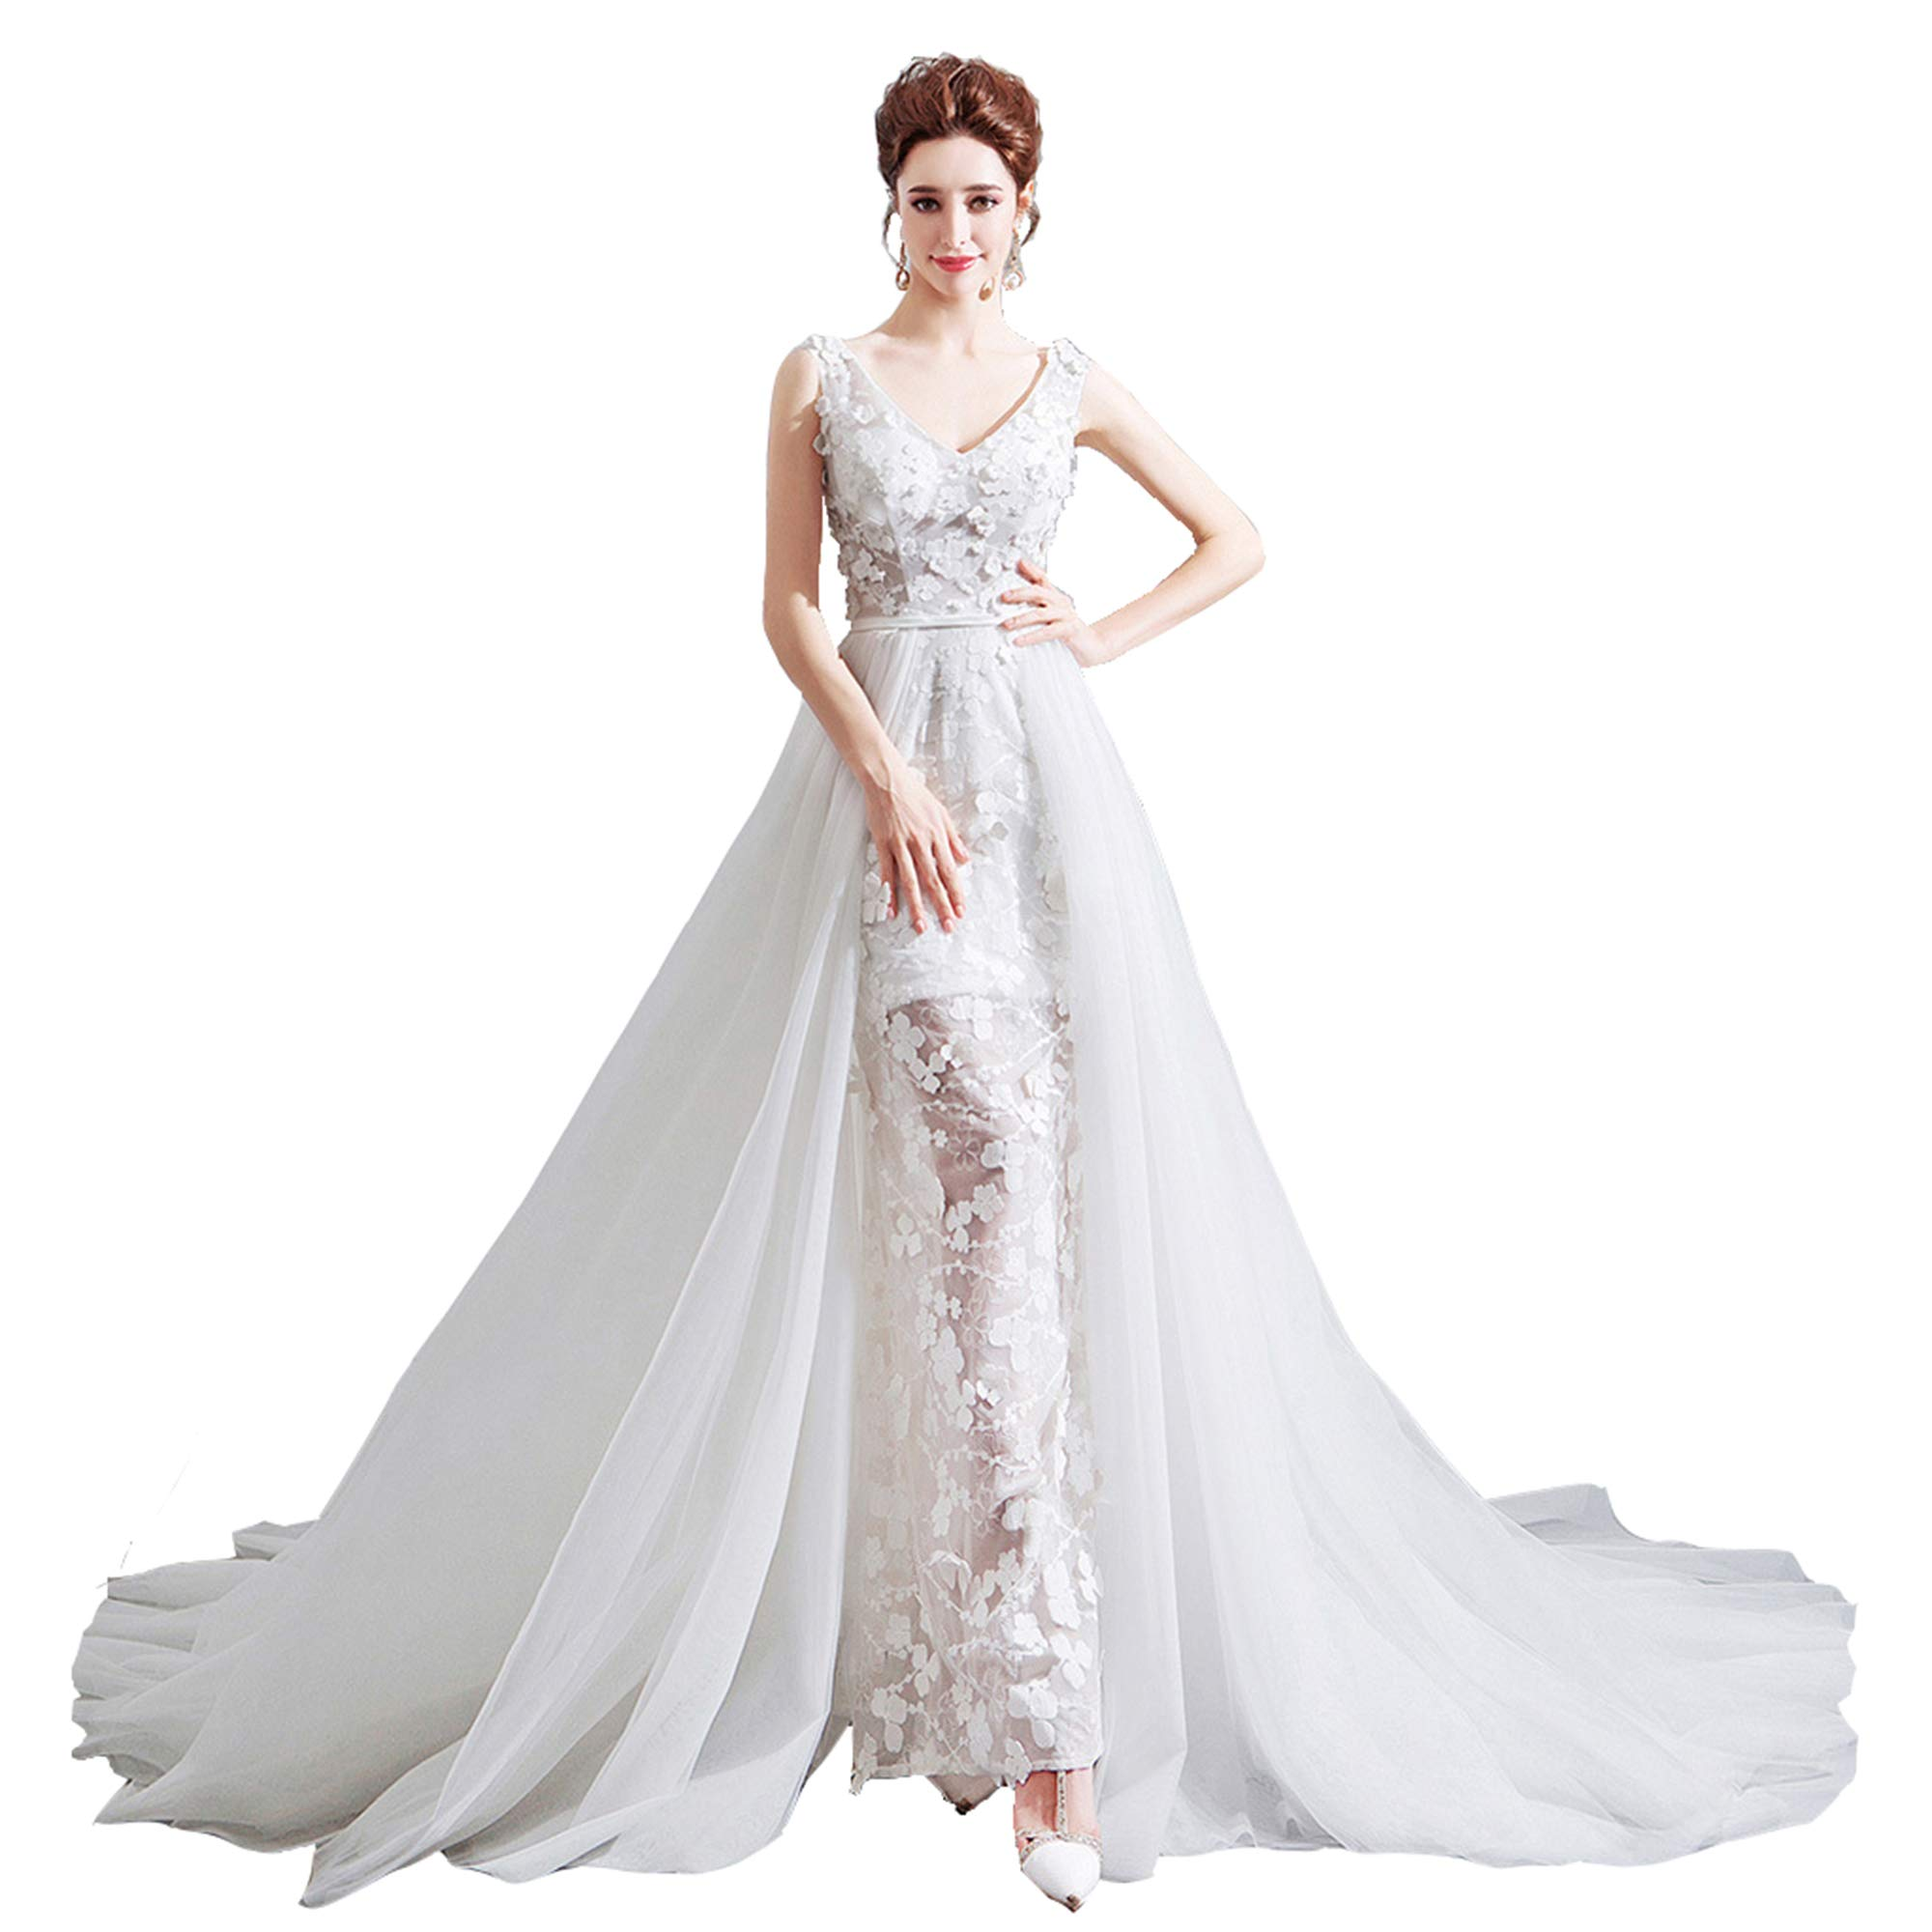 NOMSOCR Women's Lace V Neck Sleeveless Wedding Dresses Mermaid Bridal Gown (M, White)